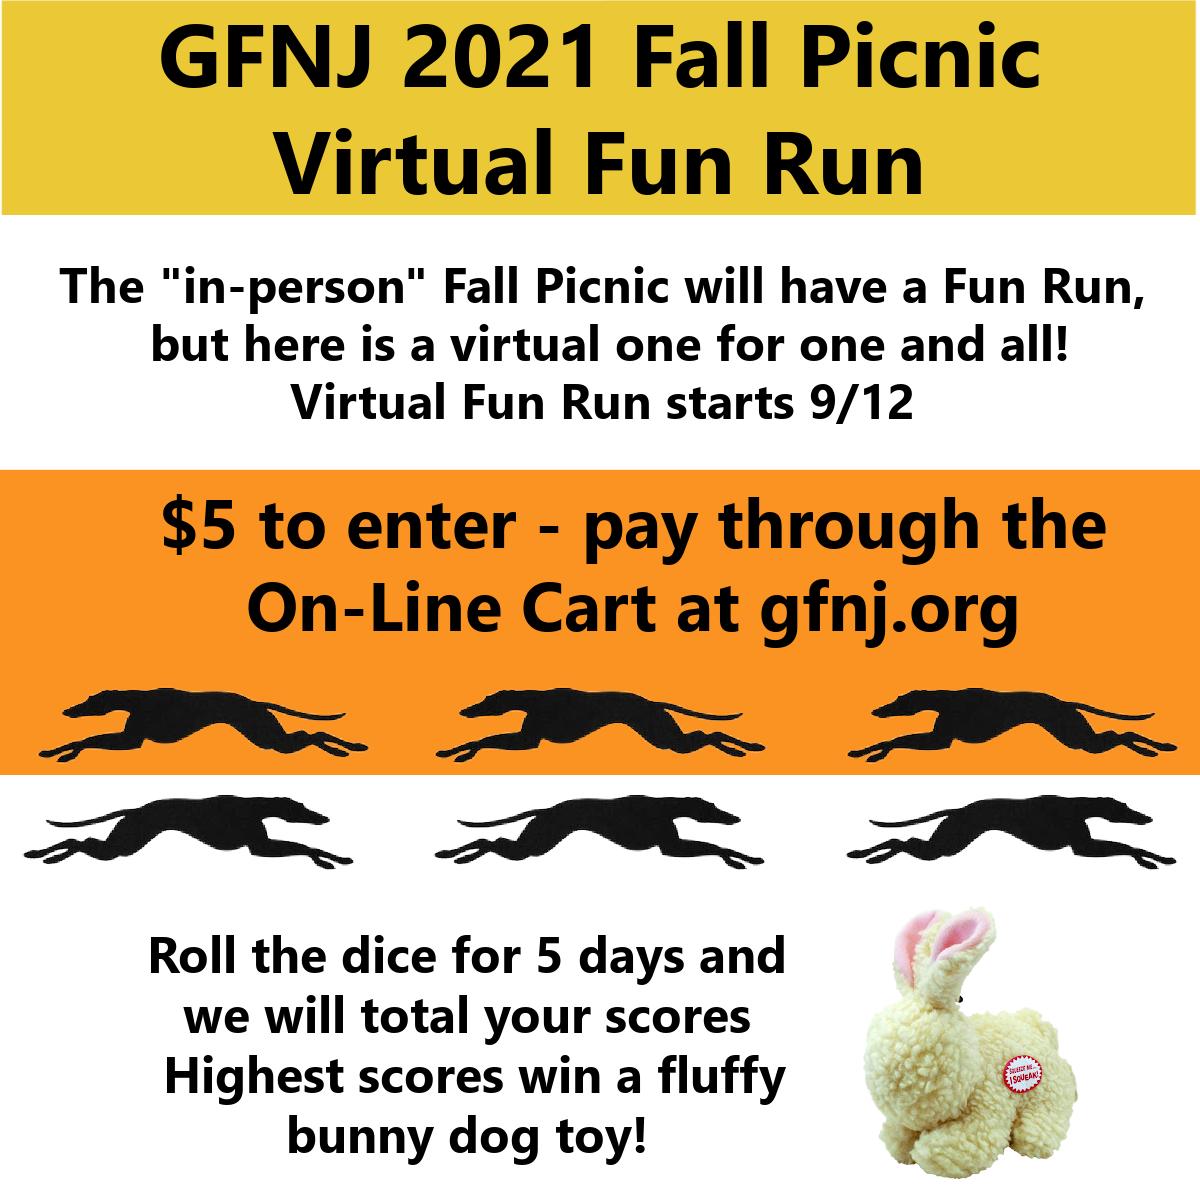 2021 Fall Picnic Virtual Fun Runa